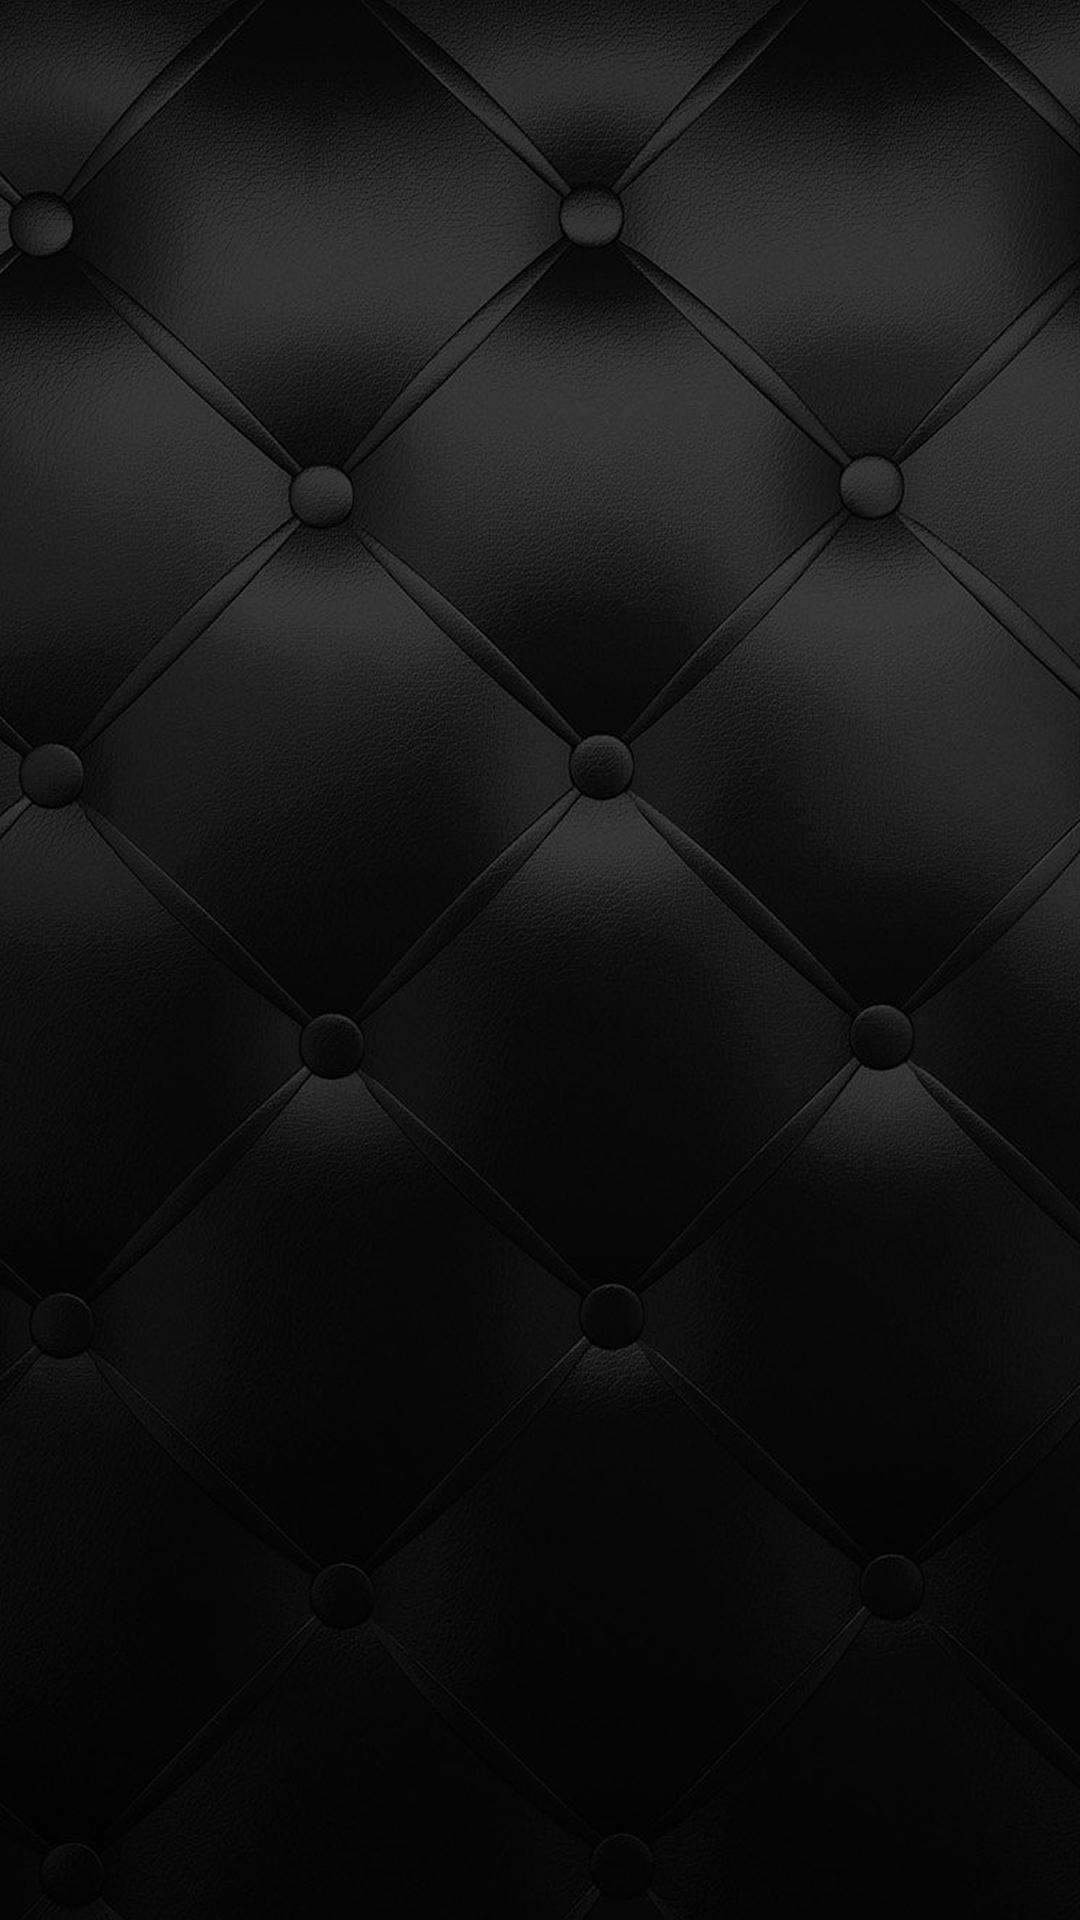 Black Texture Pattern iPhone 6 Wallpaper Download iPhone Wallpapers 1080x1920